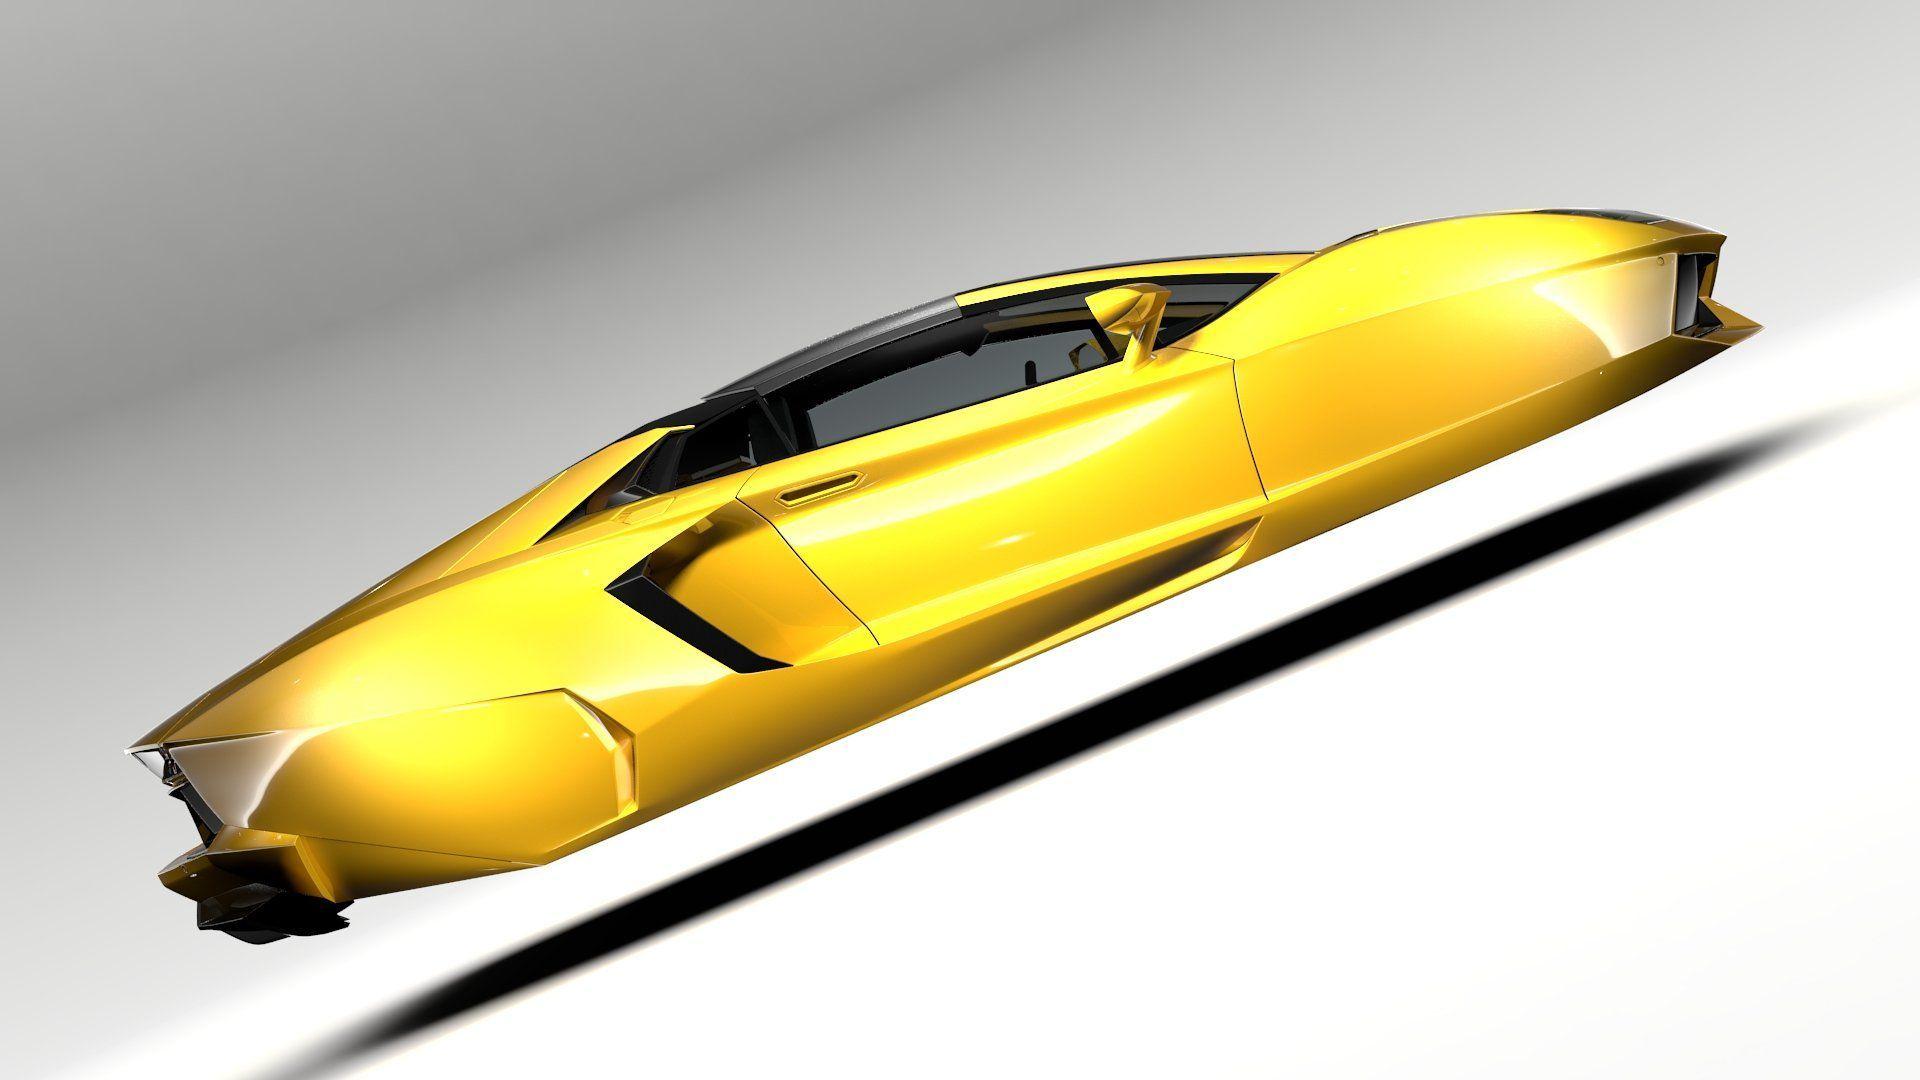 Lamborghini Aventador Flying 2017 Aventador#Flying#Lamborghini #AD #lamborghiniaventador Lamborghini Aventador Flying 2017 Aventador#Flying#Lamborghini #AD #lamborghiniaventador